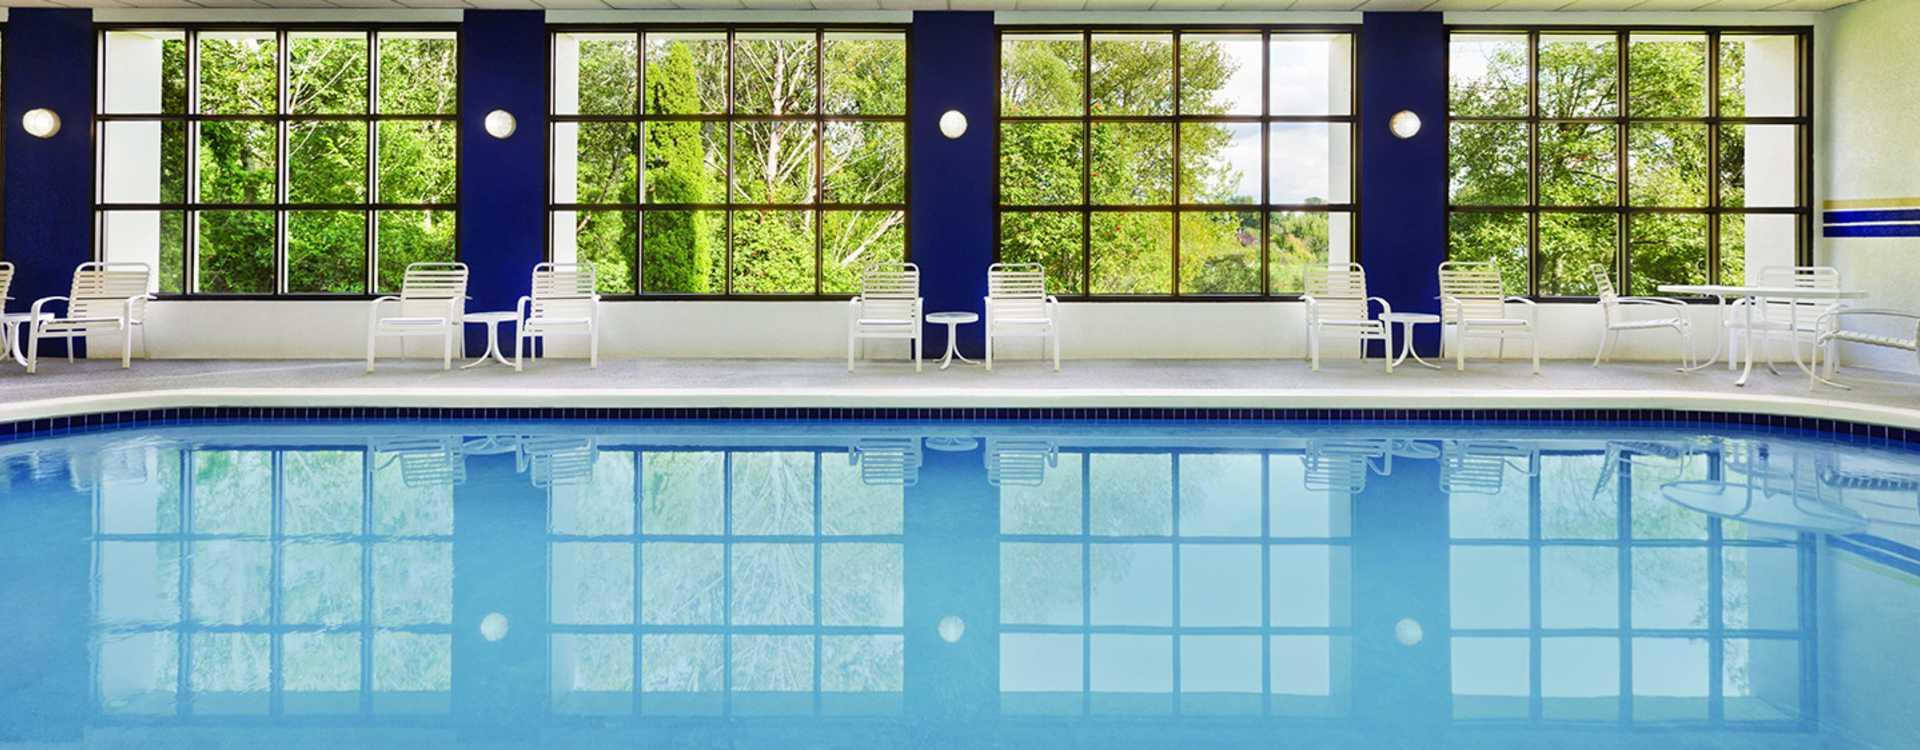 Radisson Hotel Seattle Airport Pool